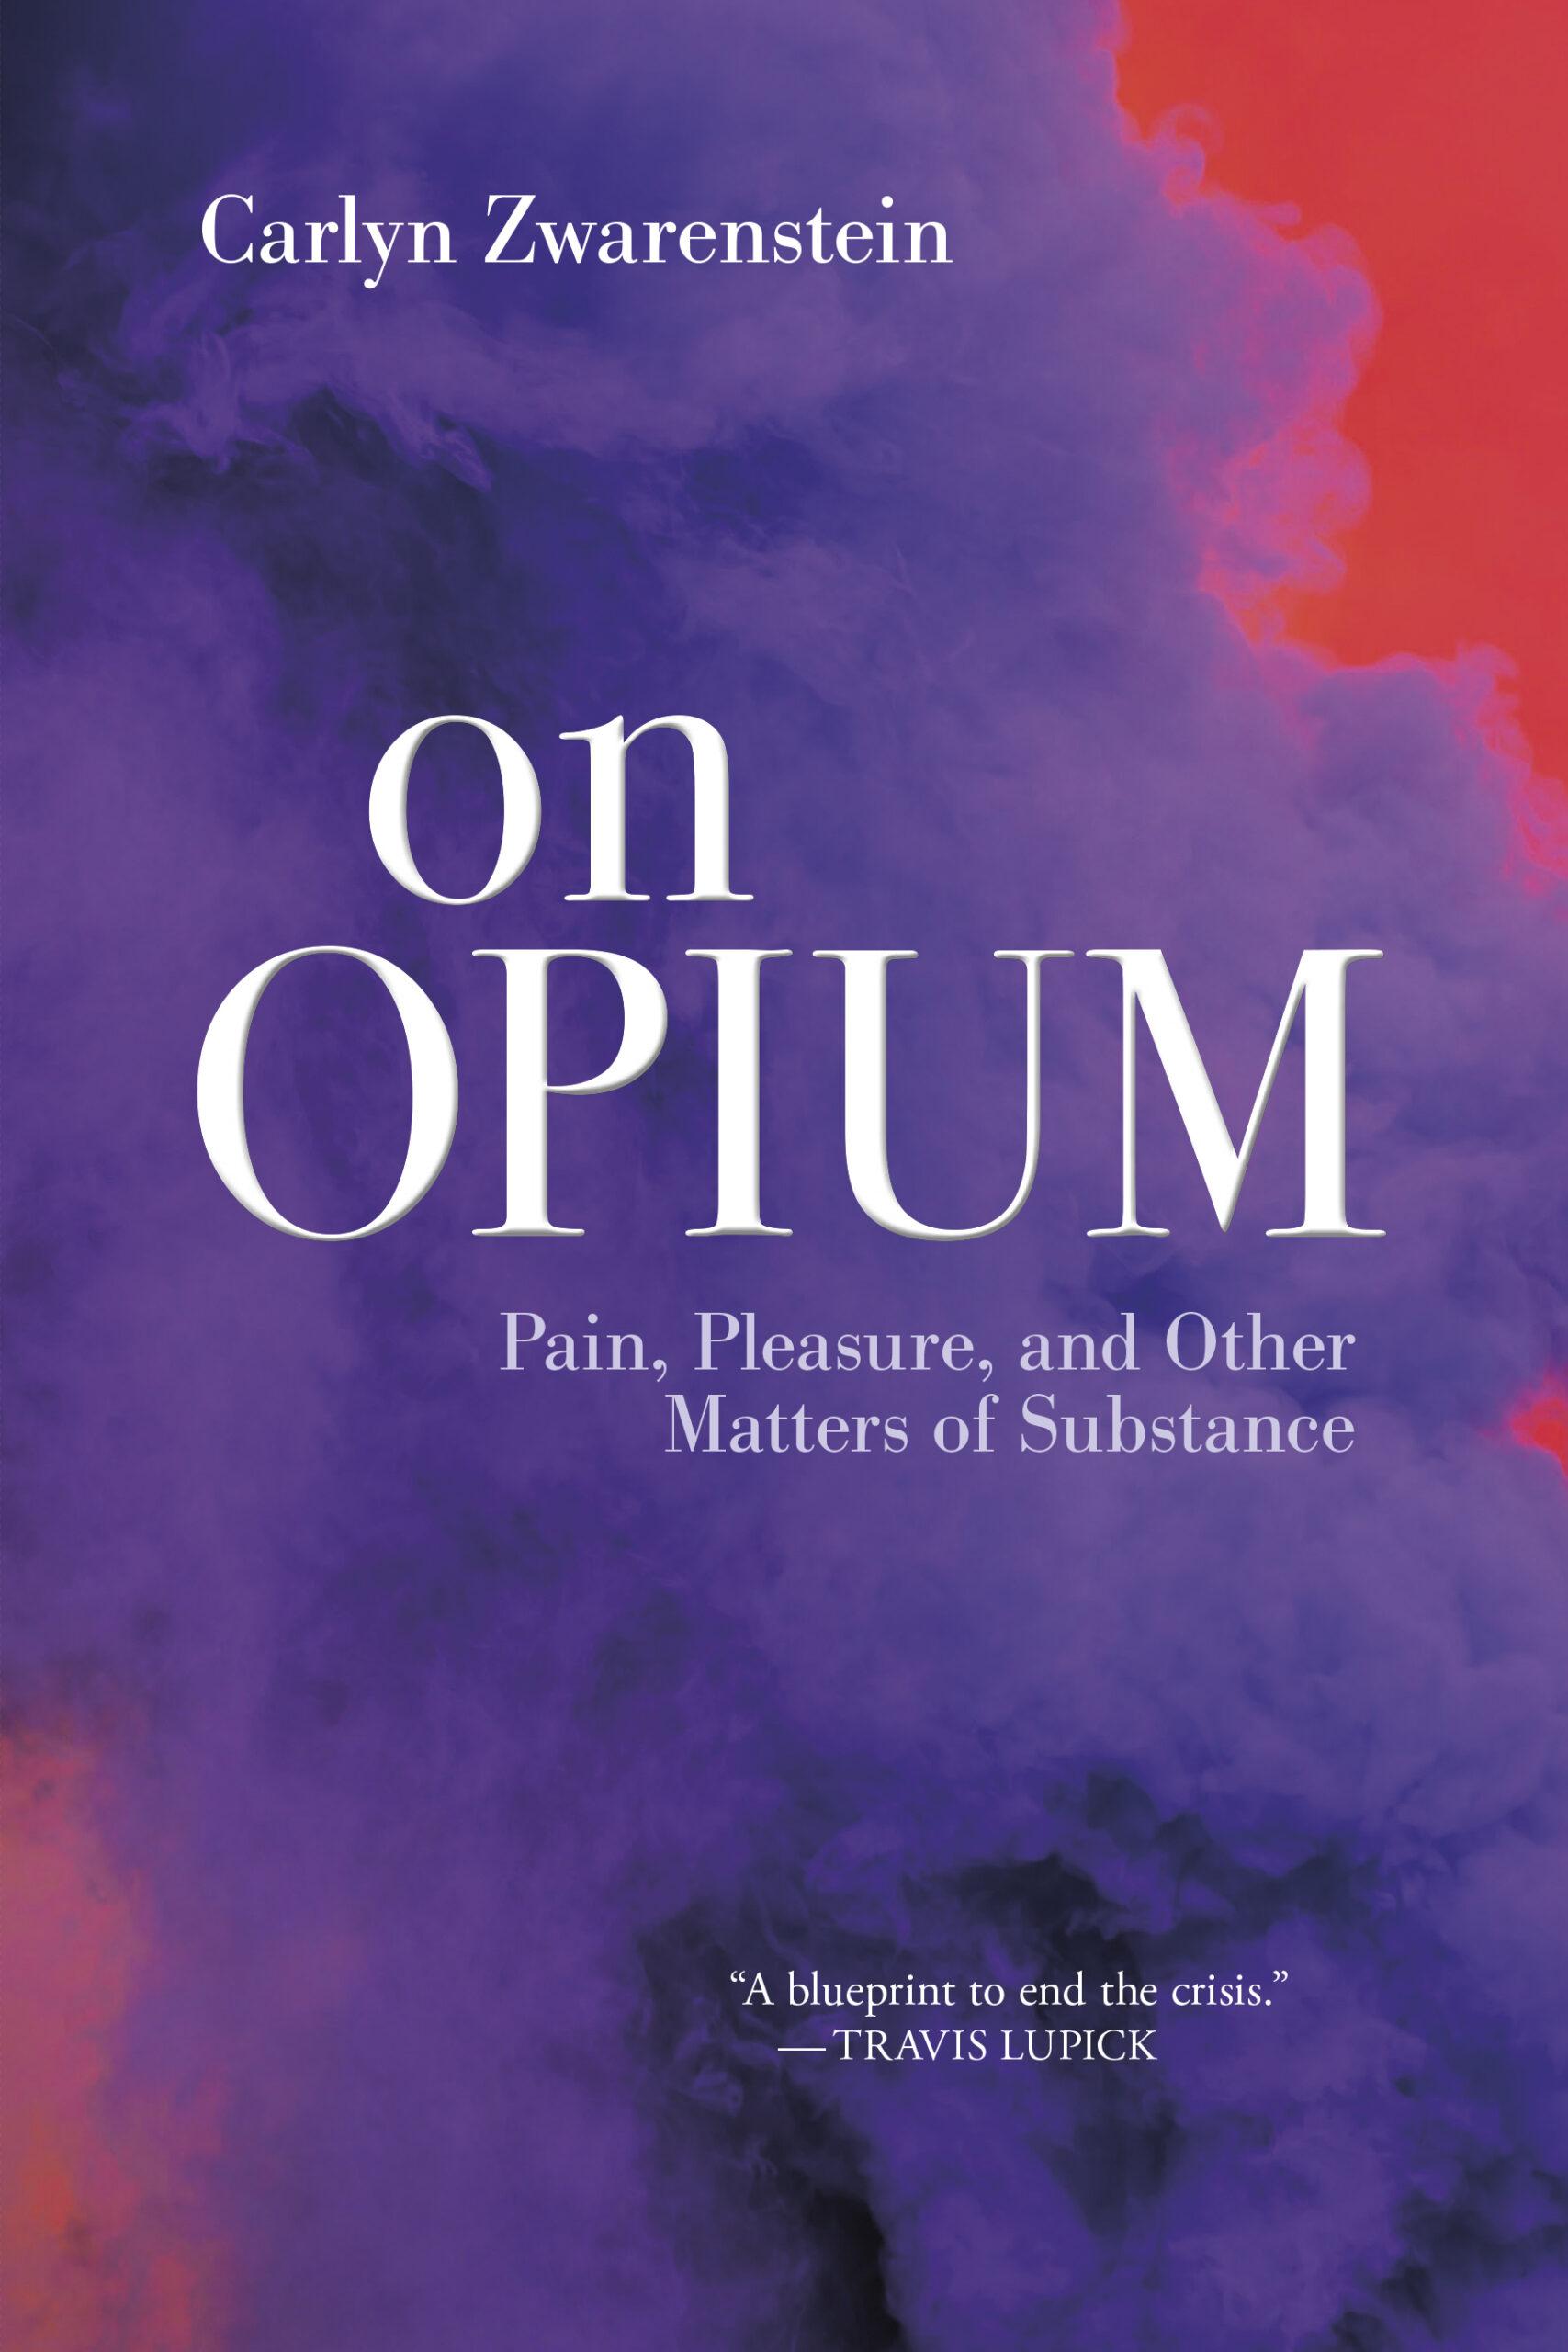 An Excerpt from On Opium by Carlyn Zwarenstein